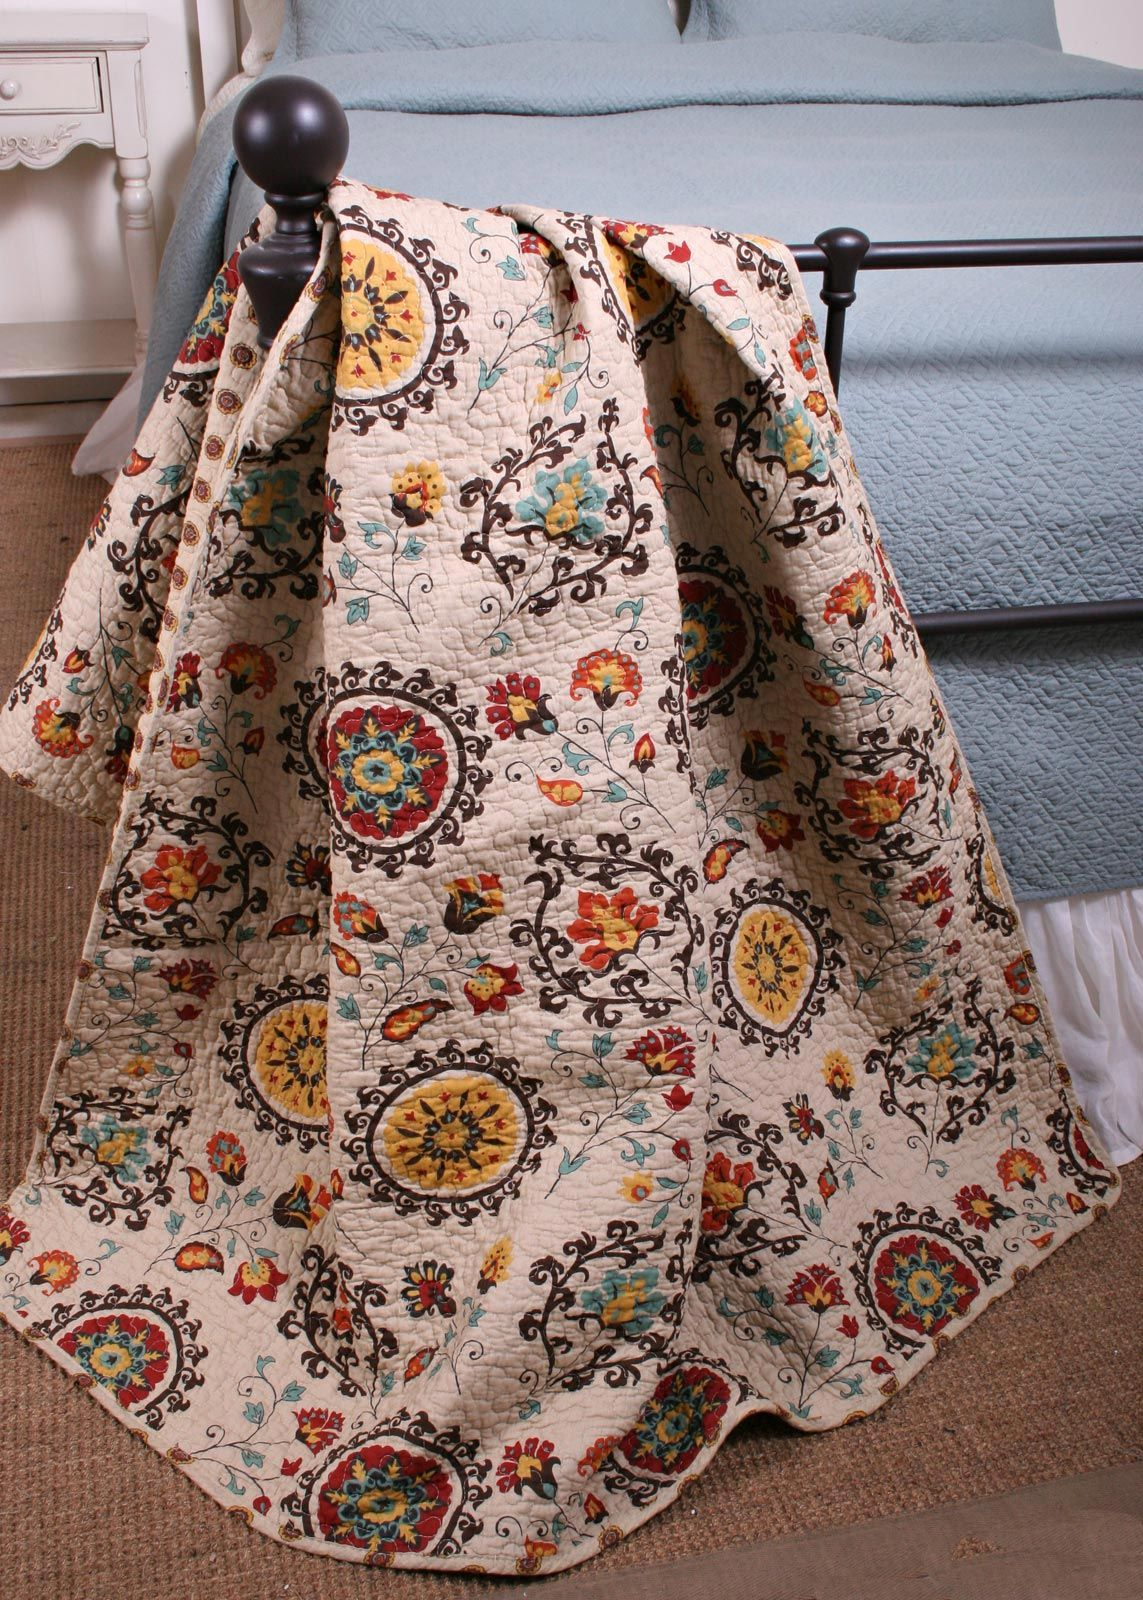 Boho Chic Collection Andora Quilt Throw | Bedroom decor ... : quilt throw - Adamdwight.com